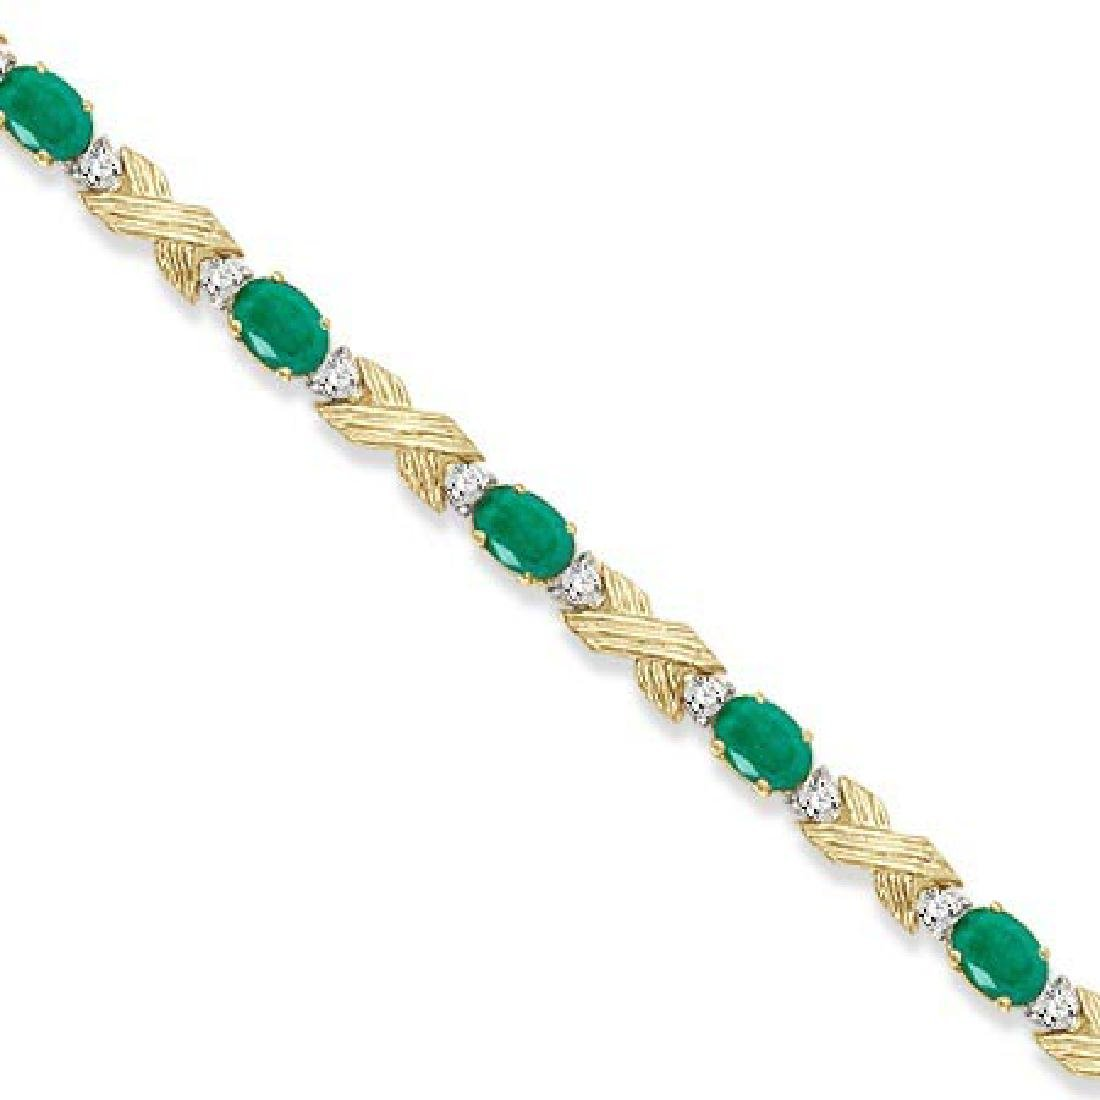 Emerald and Diamond XOXO Link Bracelet in 14k Yellow Go